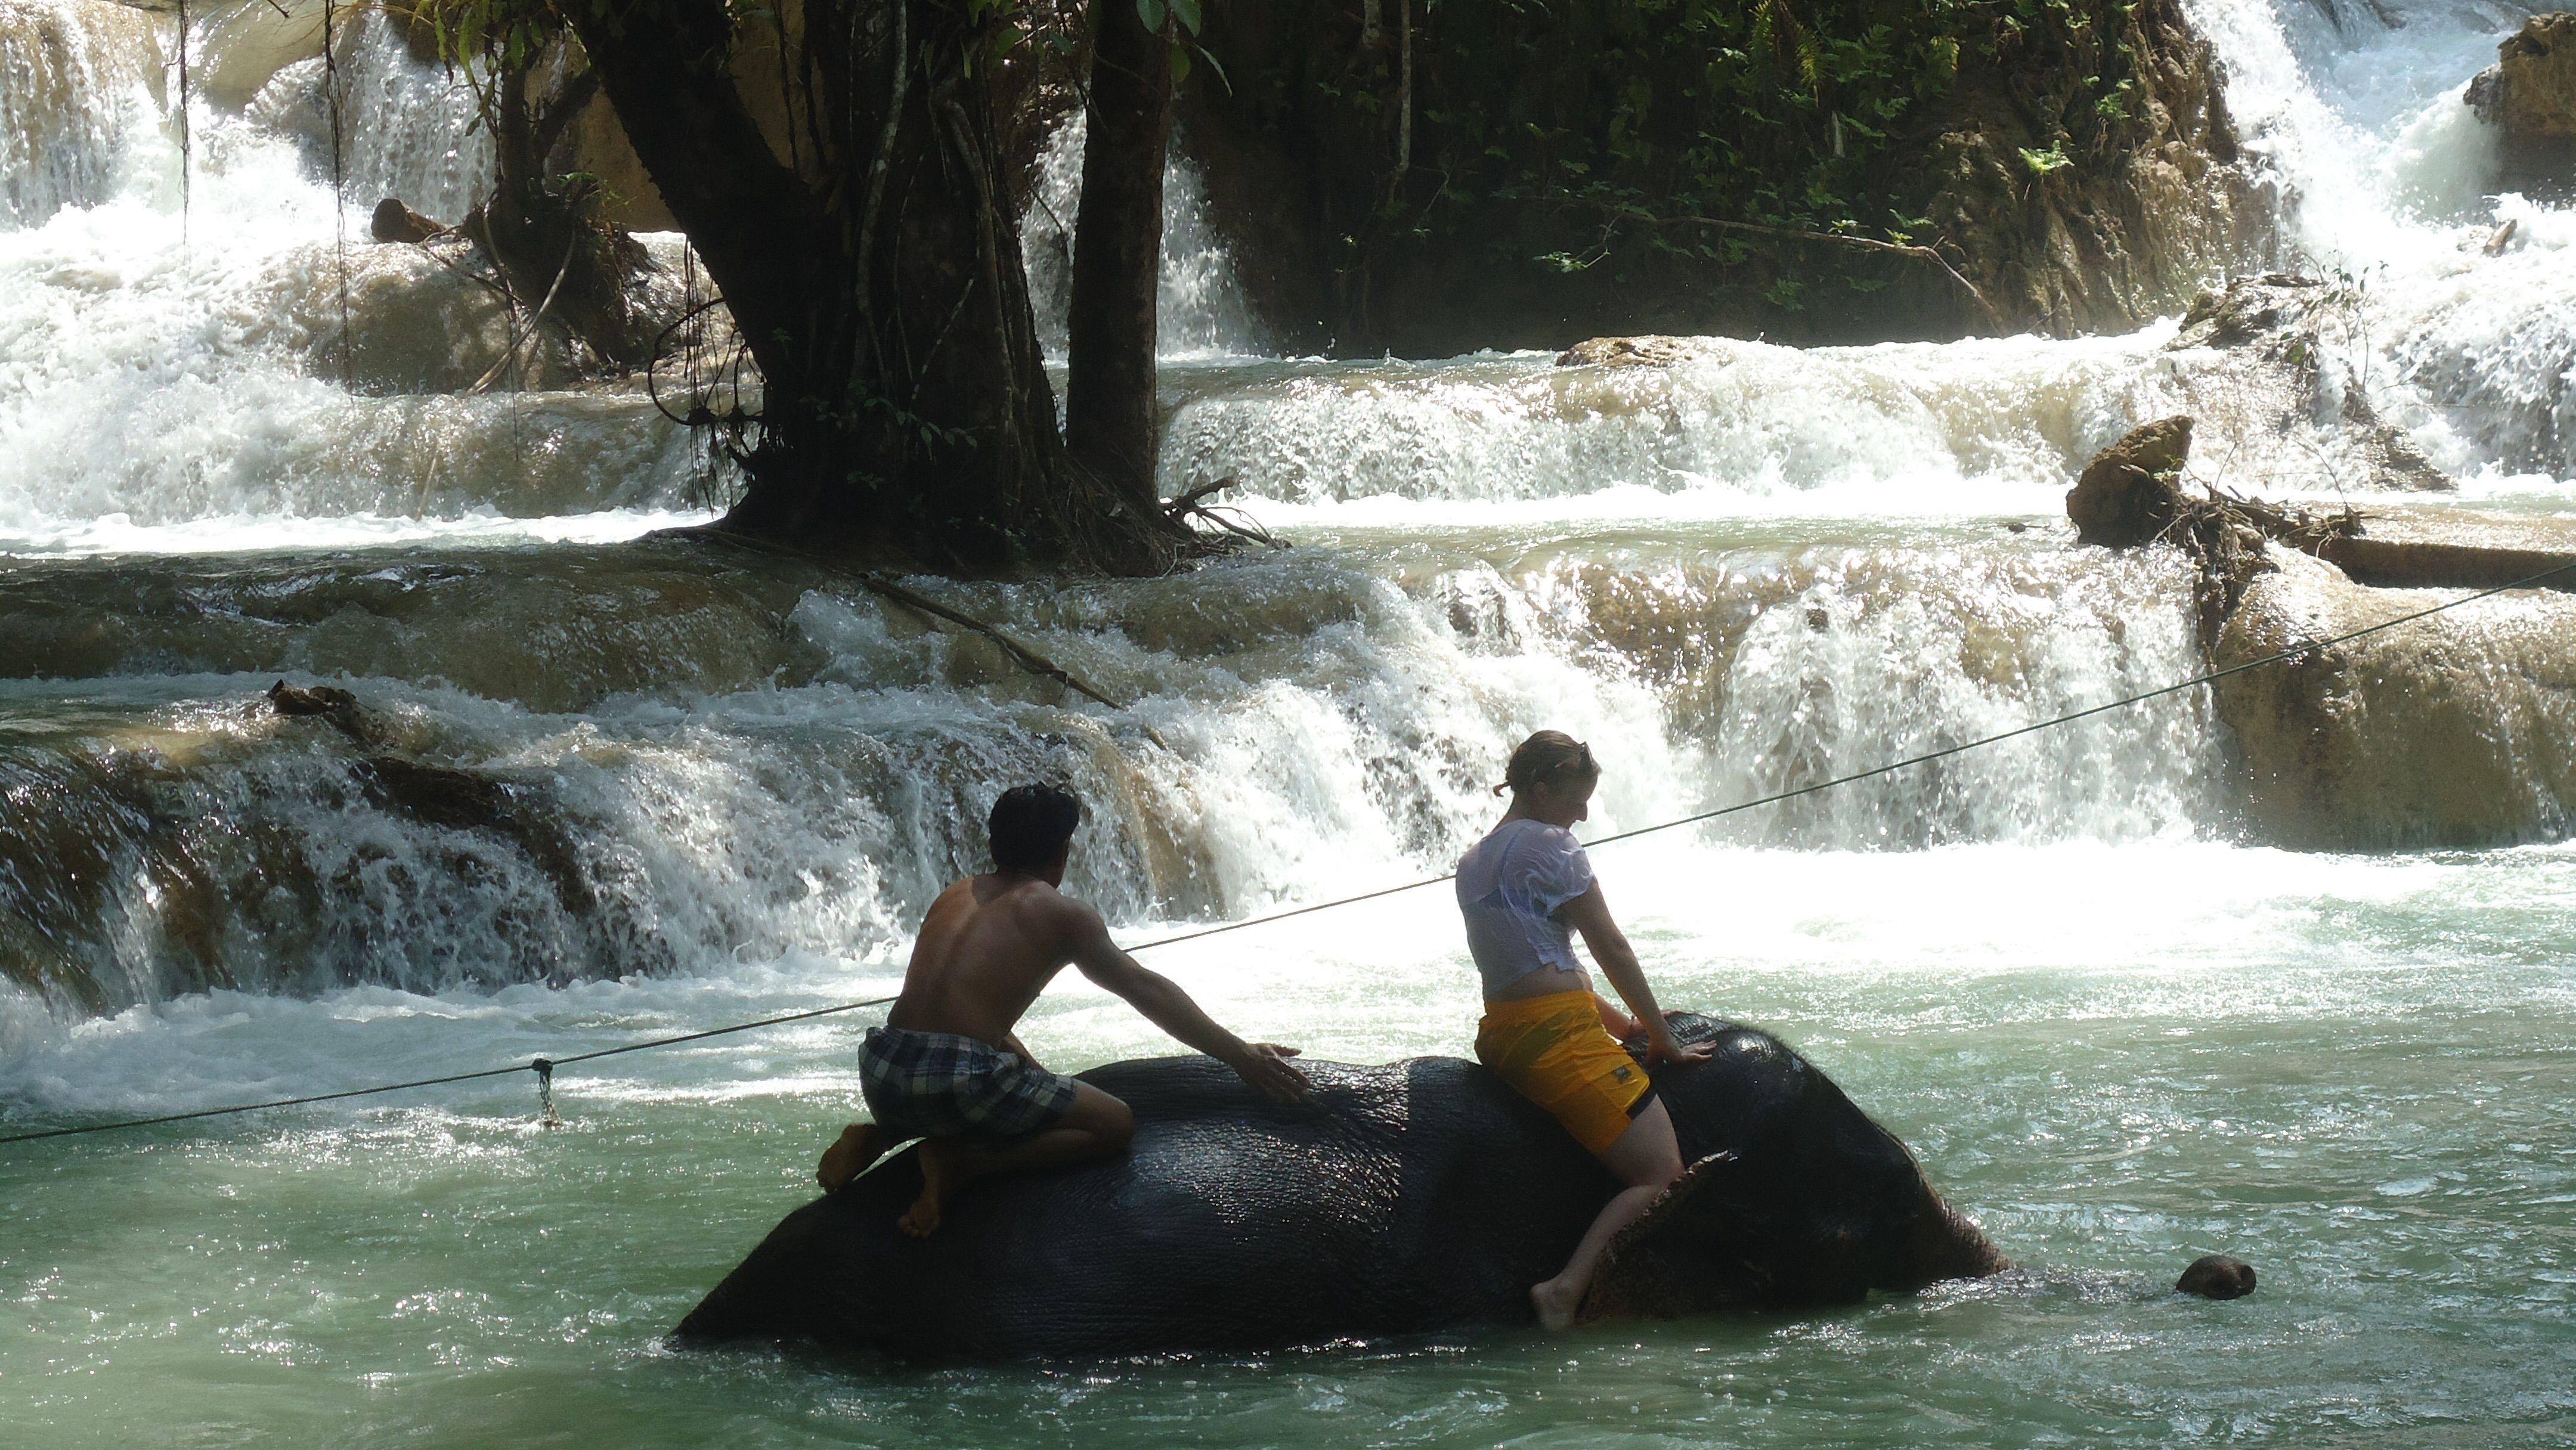 Sexy Woman riding bareback barefoot on an Elephant in the Jungle/Sexy Frau reitet ohne Sattel barfuß auf einem Elefant im Dschungel .